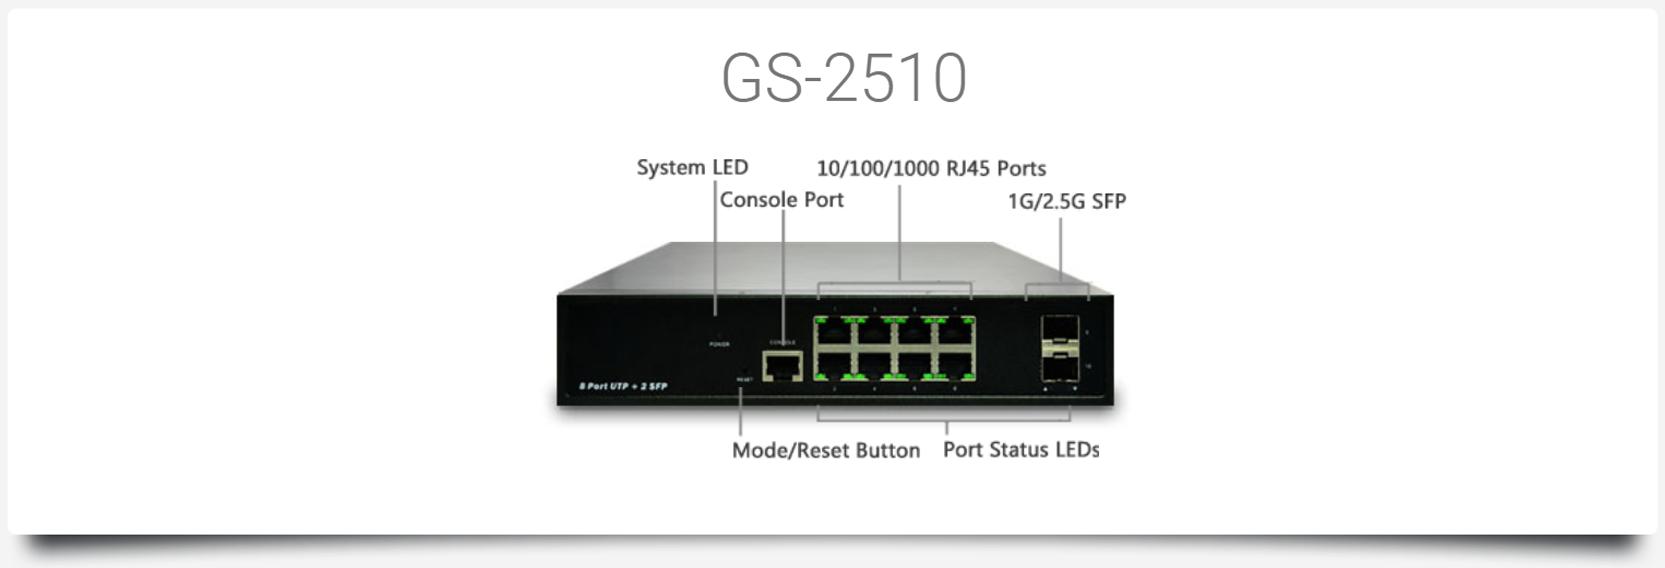 GS-2510